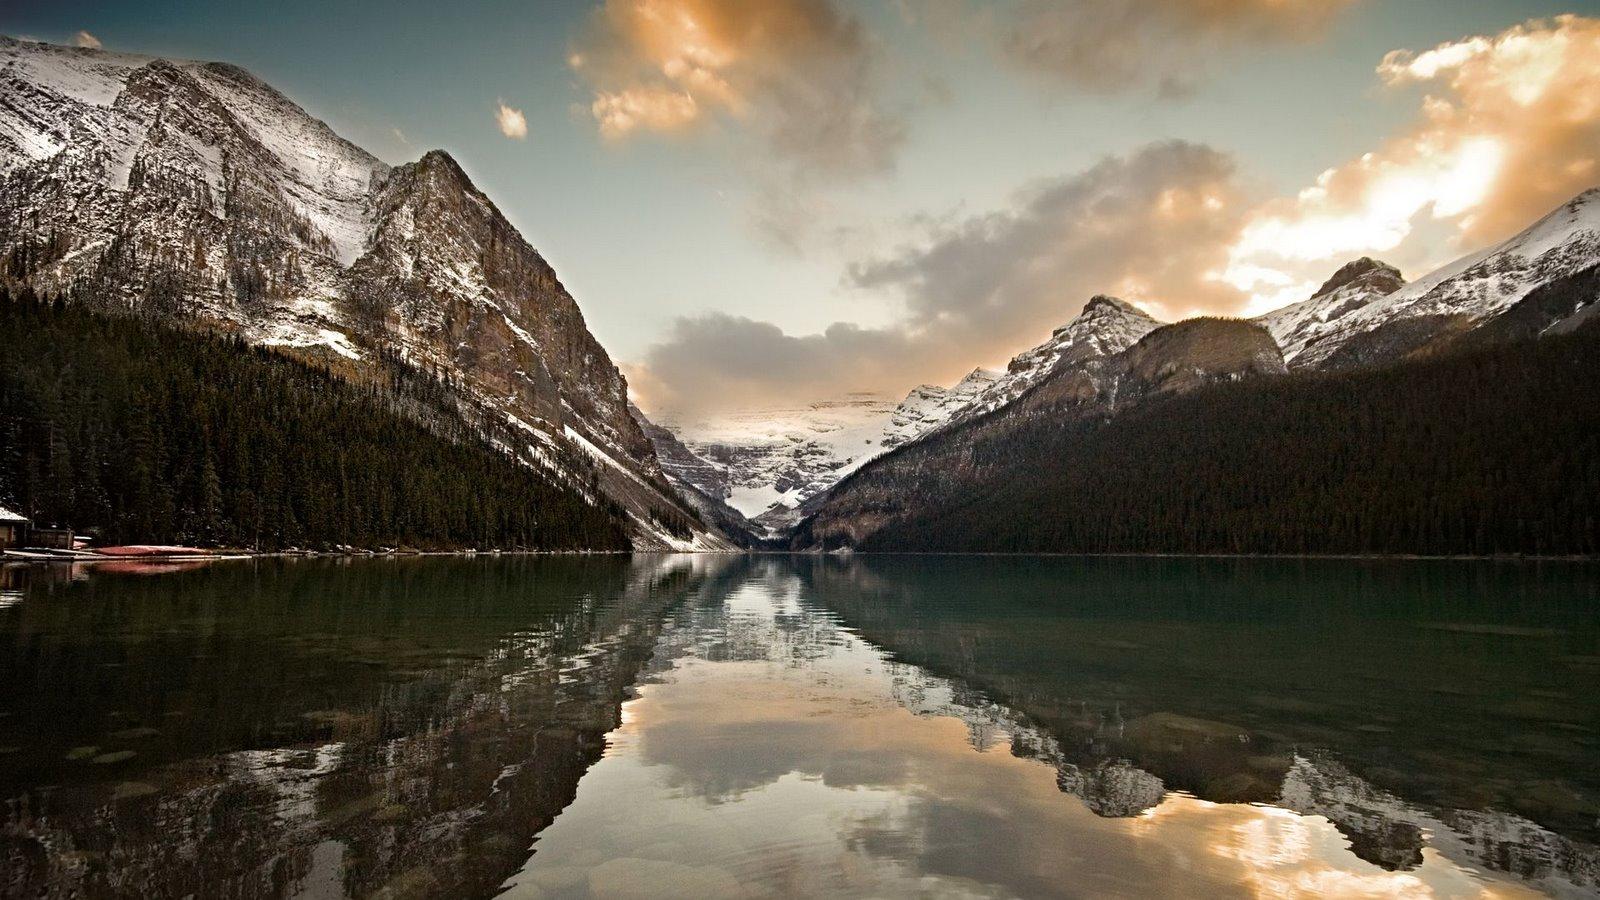 Nature 1080p Wallpapers | HD WALLPAPER